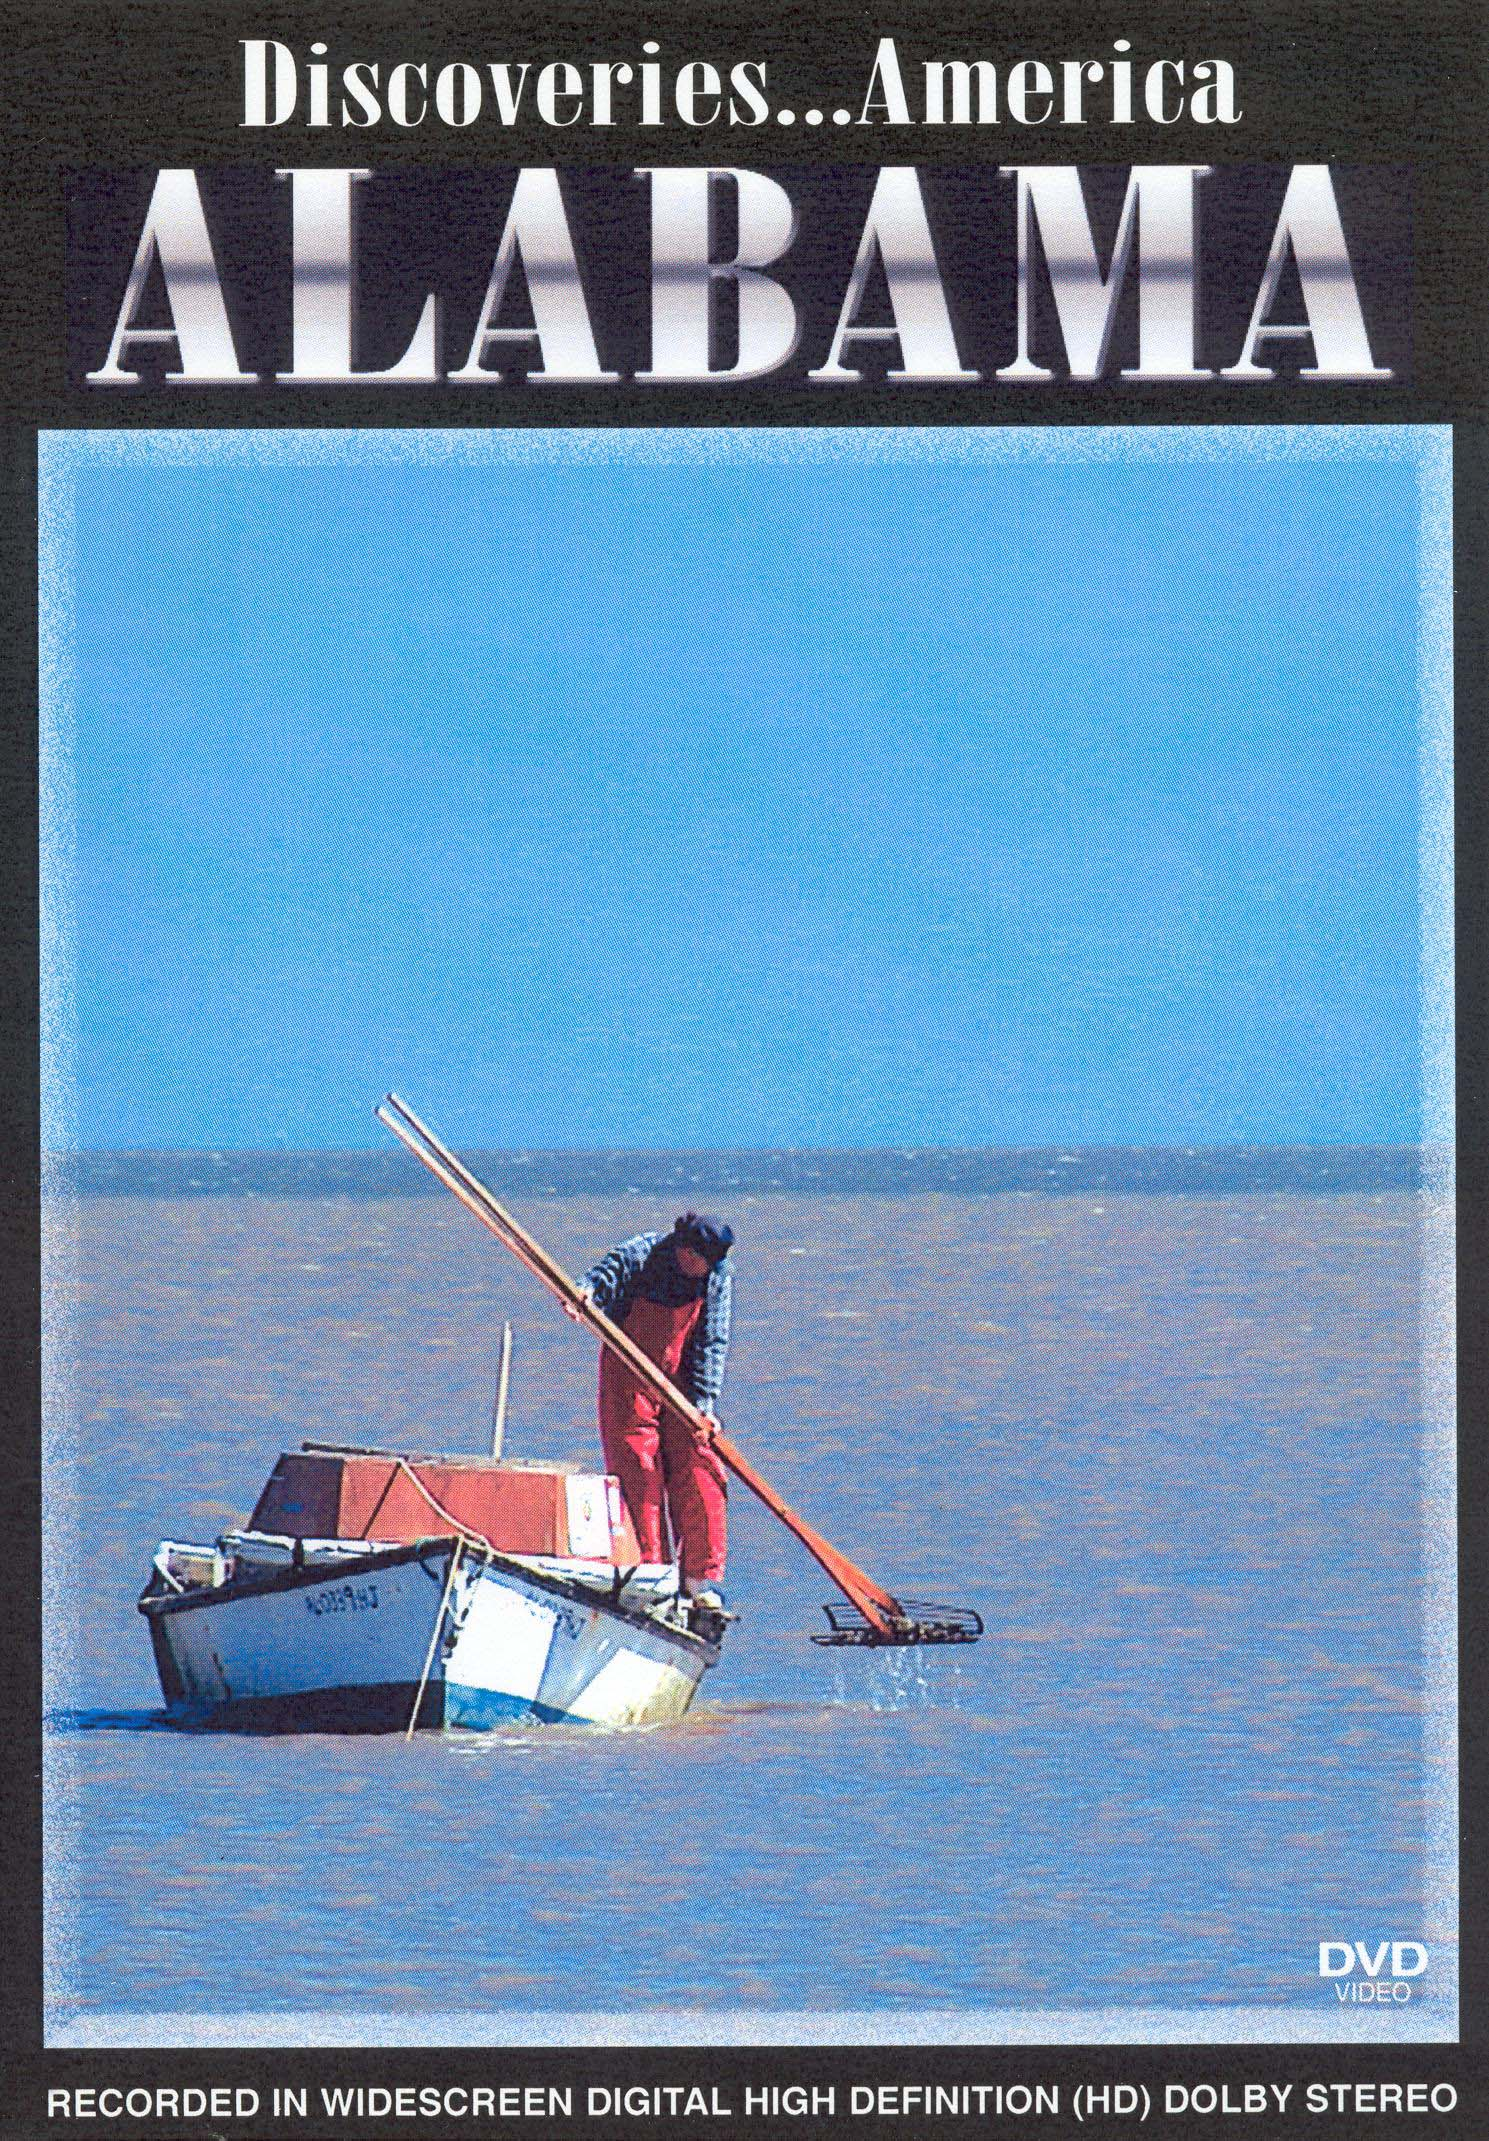 Discoveries... America: Alabama